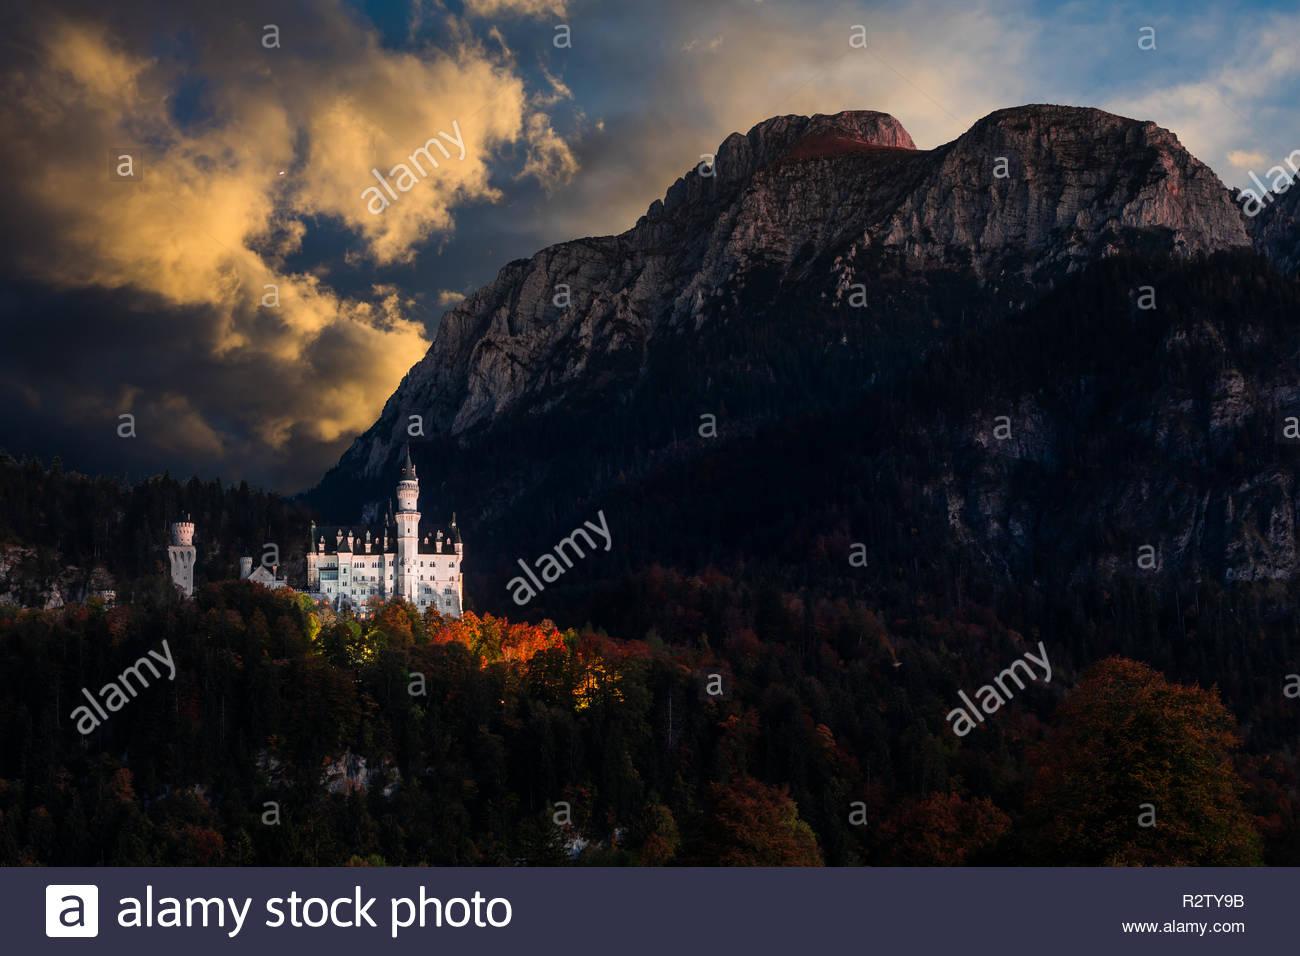 Amazing sunset view on Neuschwanstein. Bavaria, Germany. - Stock Image